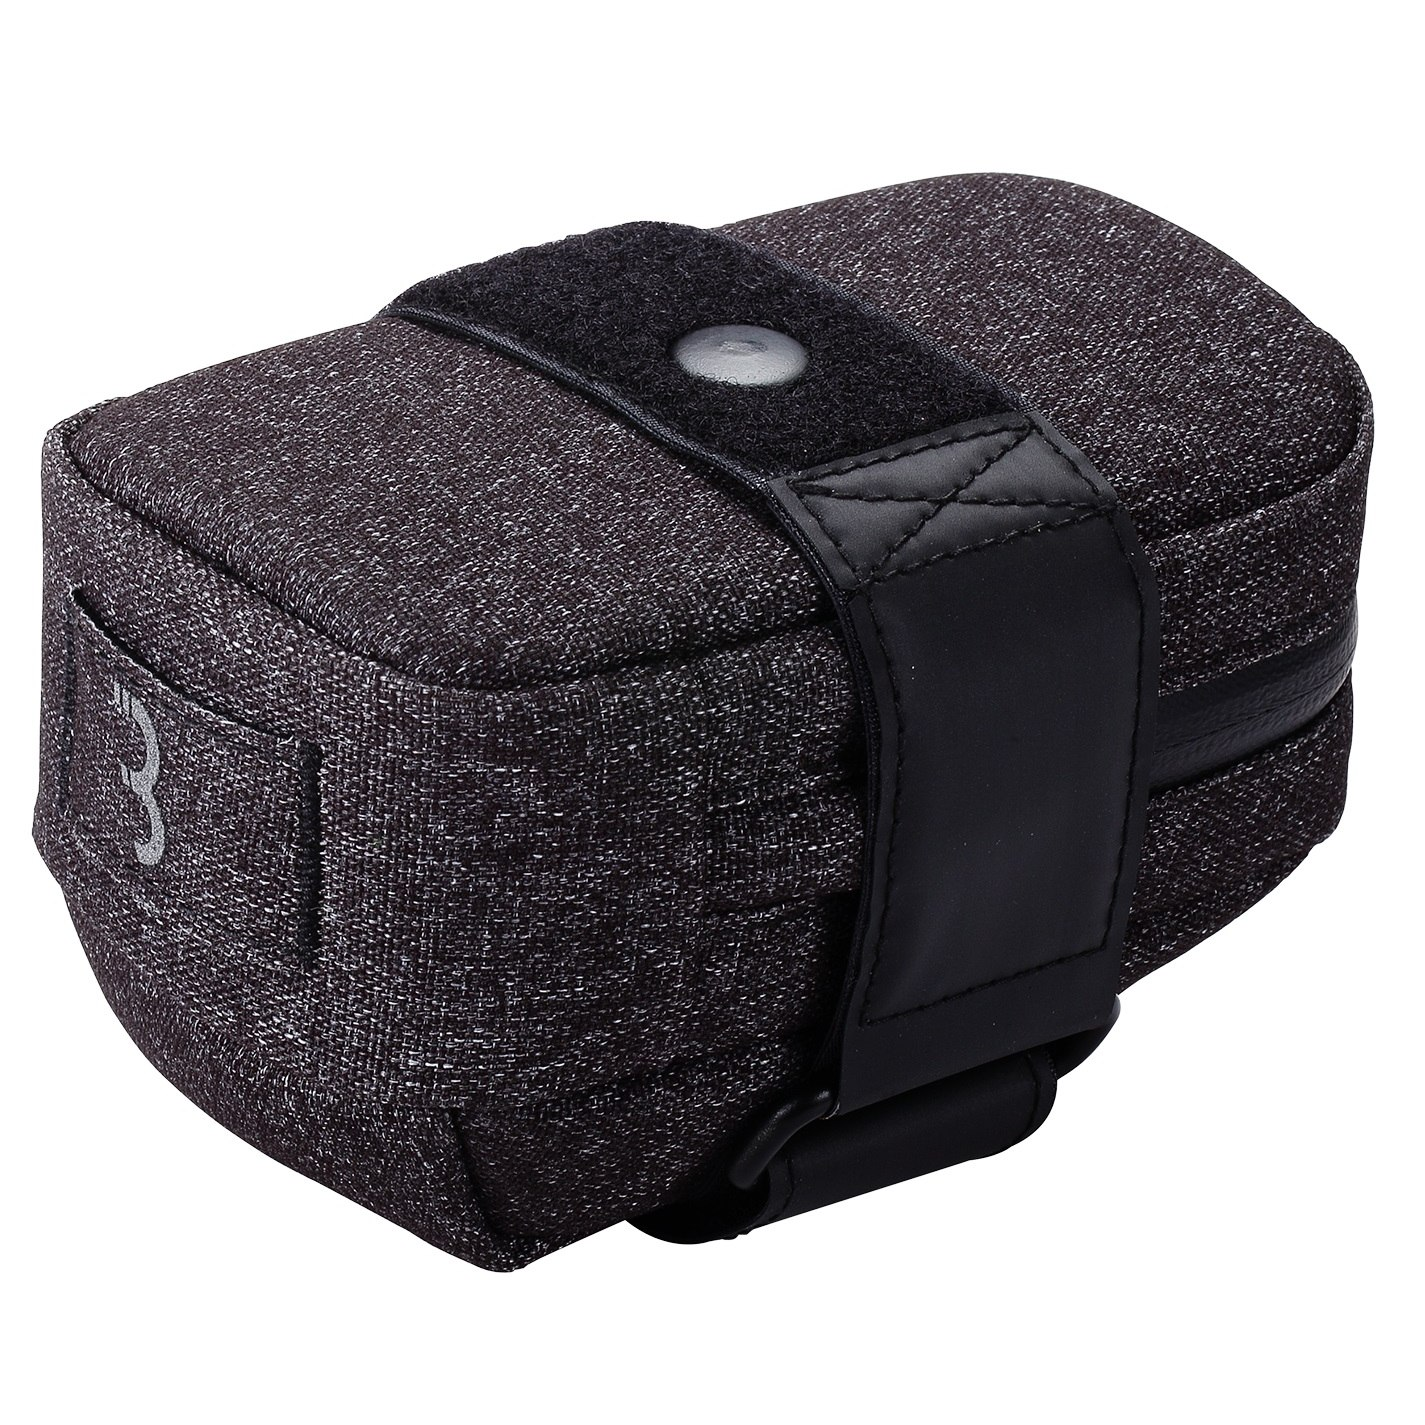 BBB Cycling Compack BSB-41 L Saddle Bag - black